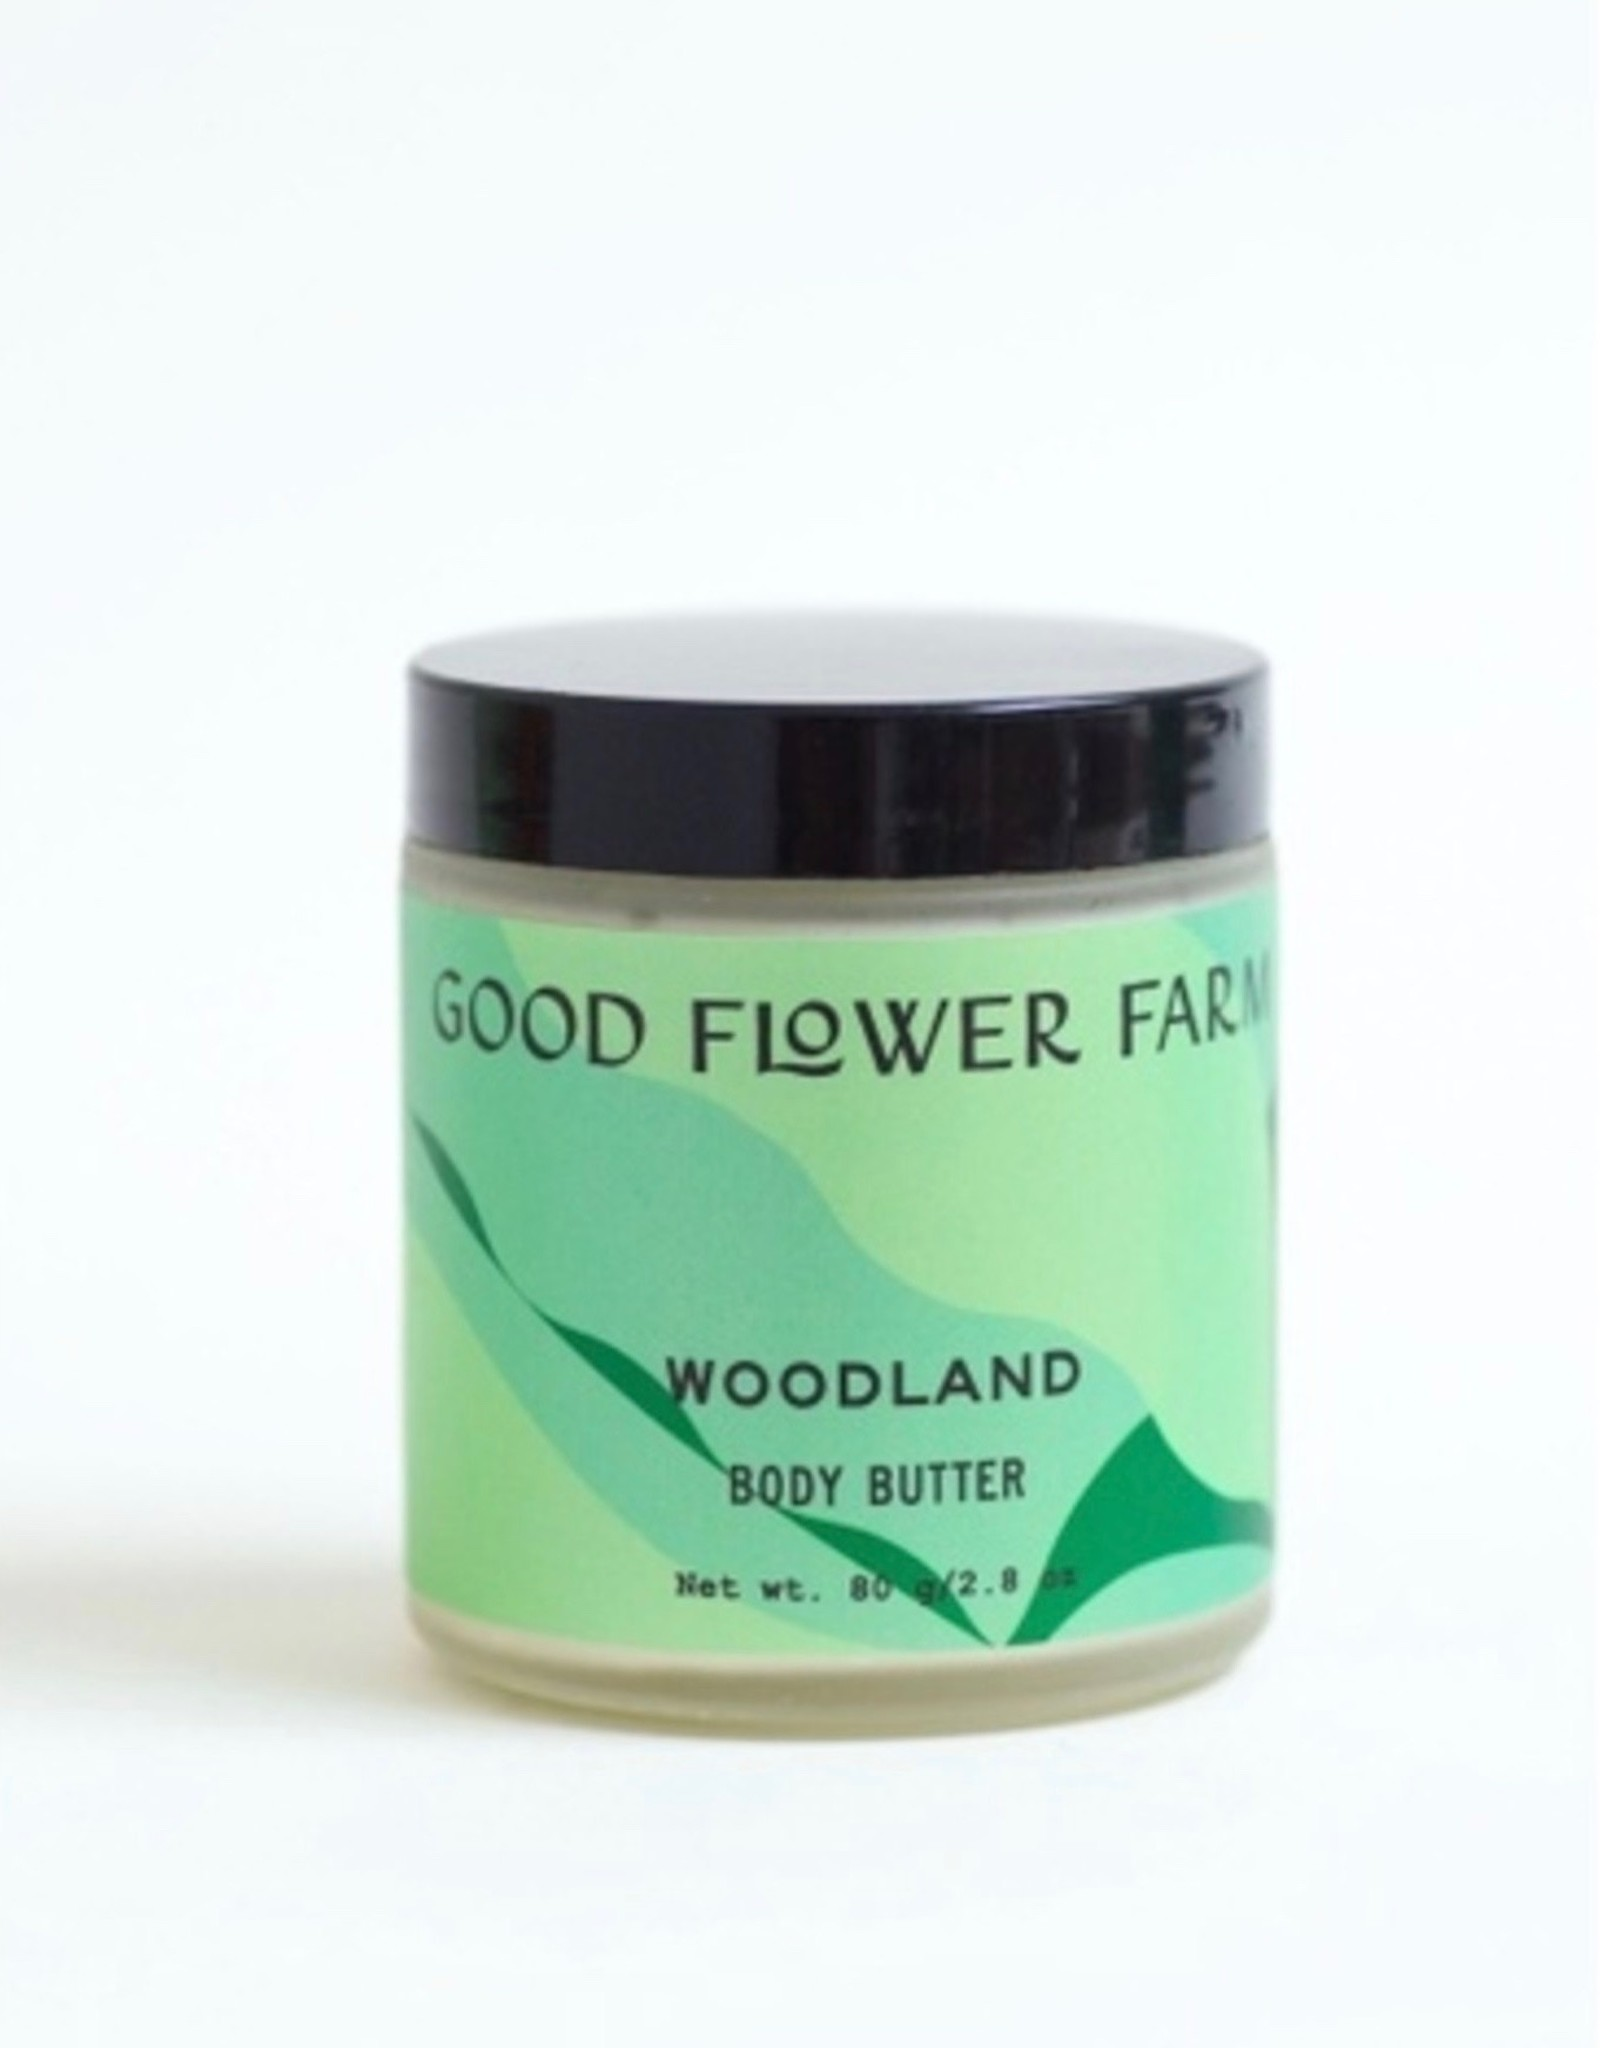 Good Flower Farm Woodland Body Butter